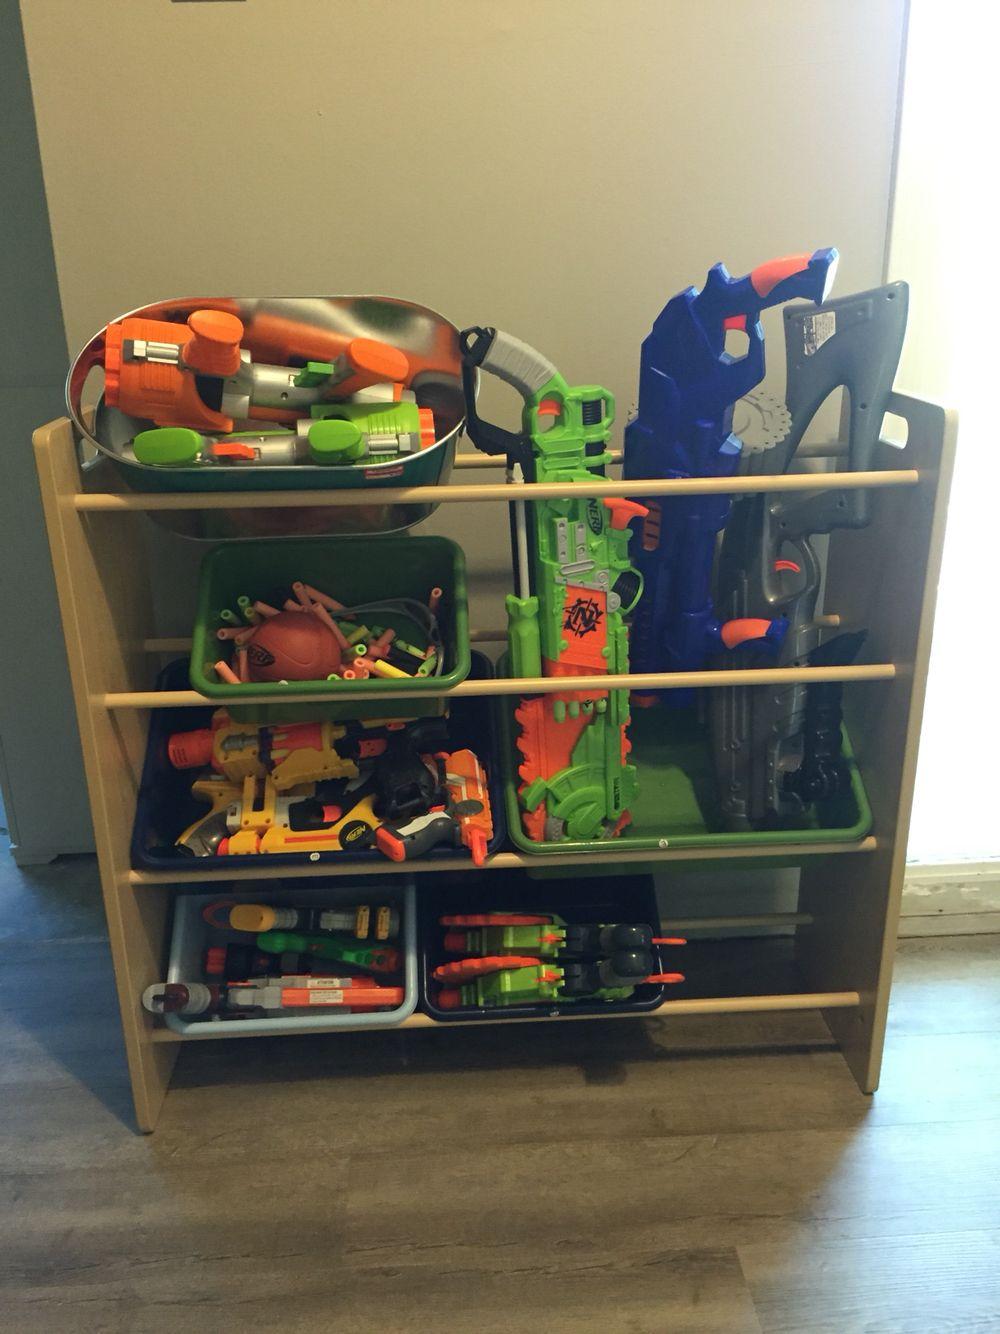 2019 New Wardrobe Kids Organizer Bins Box For Toys: Nerf Gun Storage, Toy